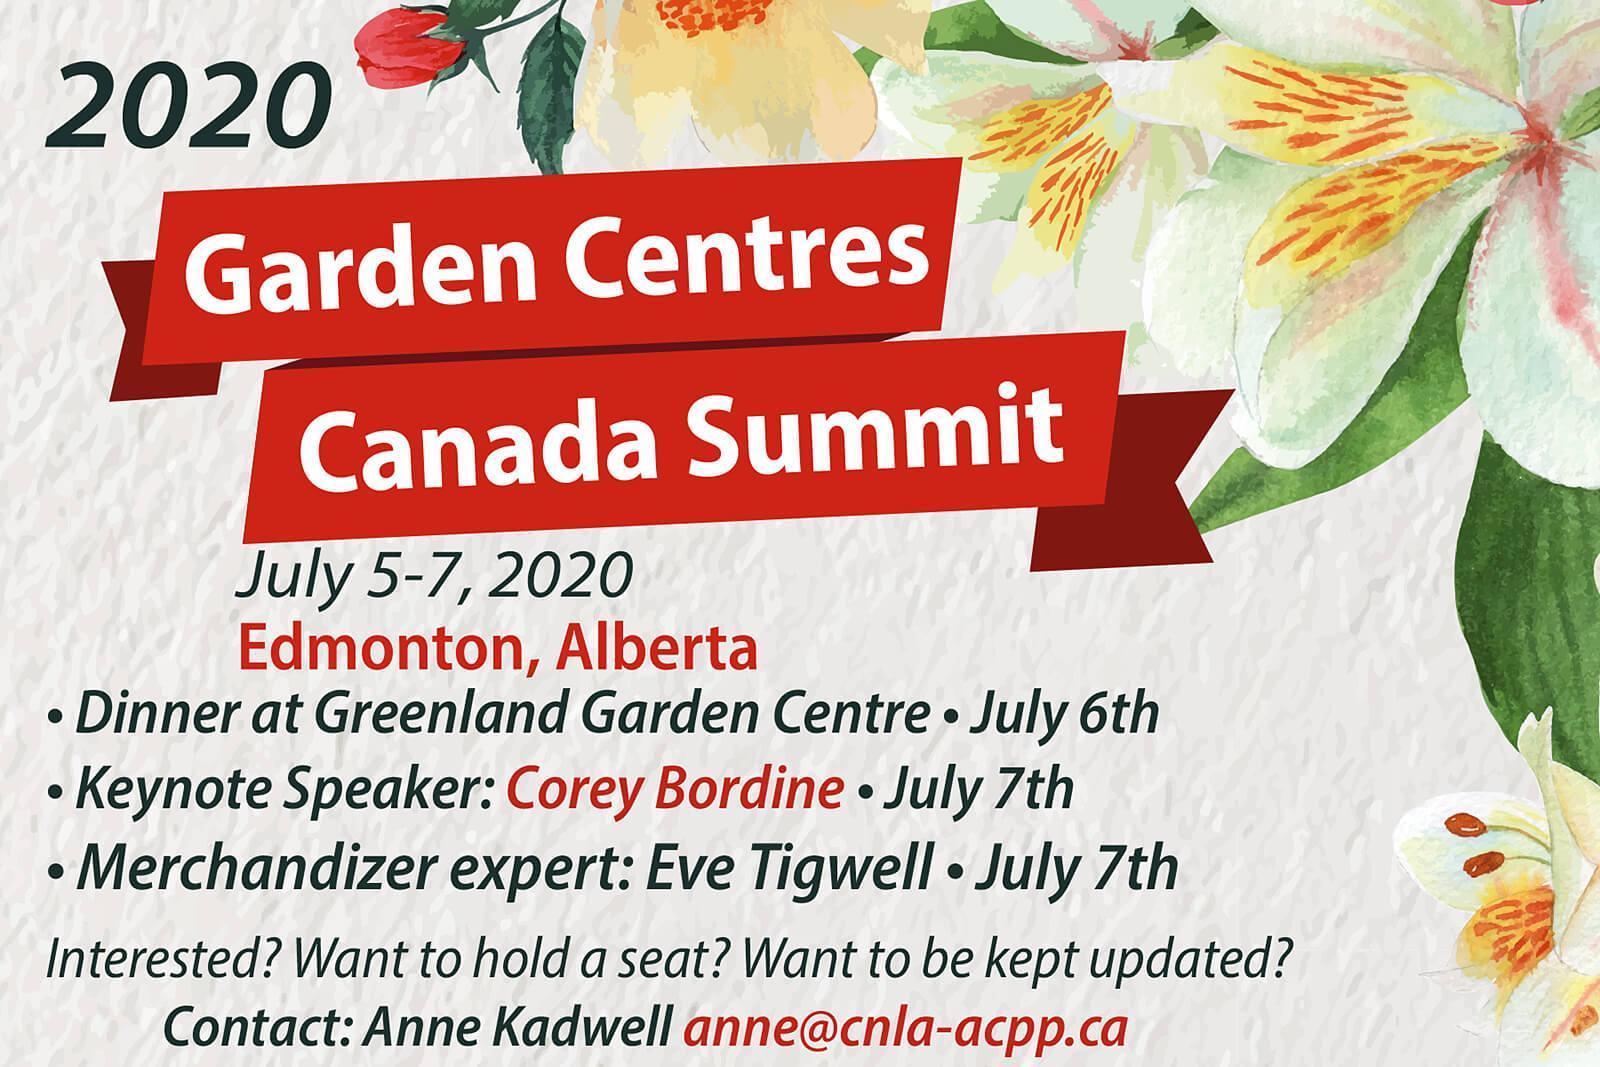 2020 Garden Centres Canada Summit